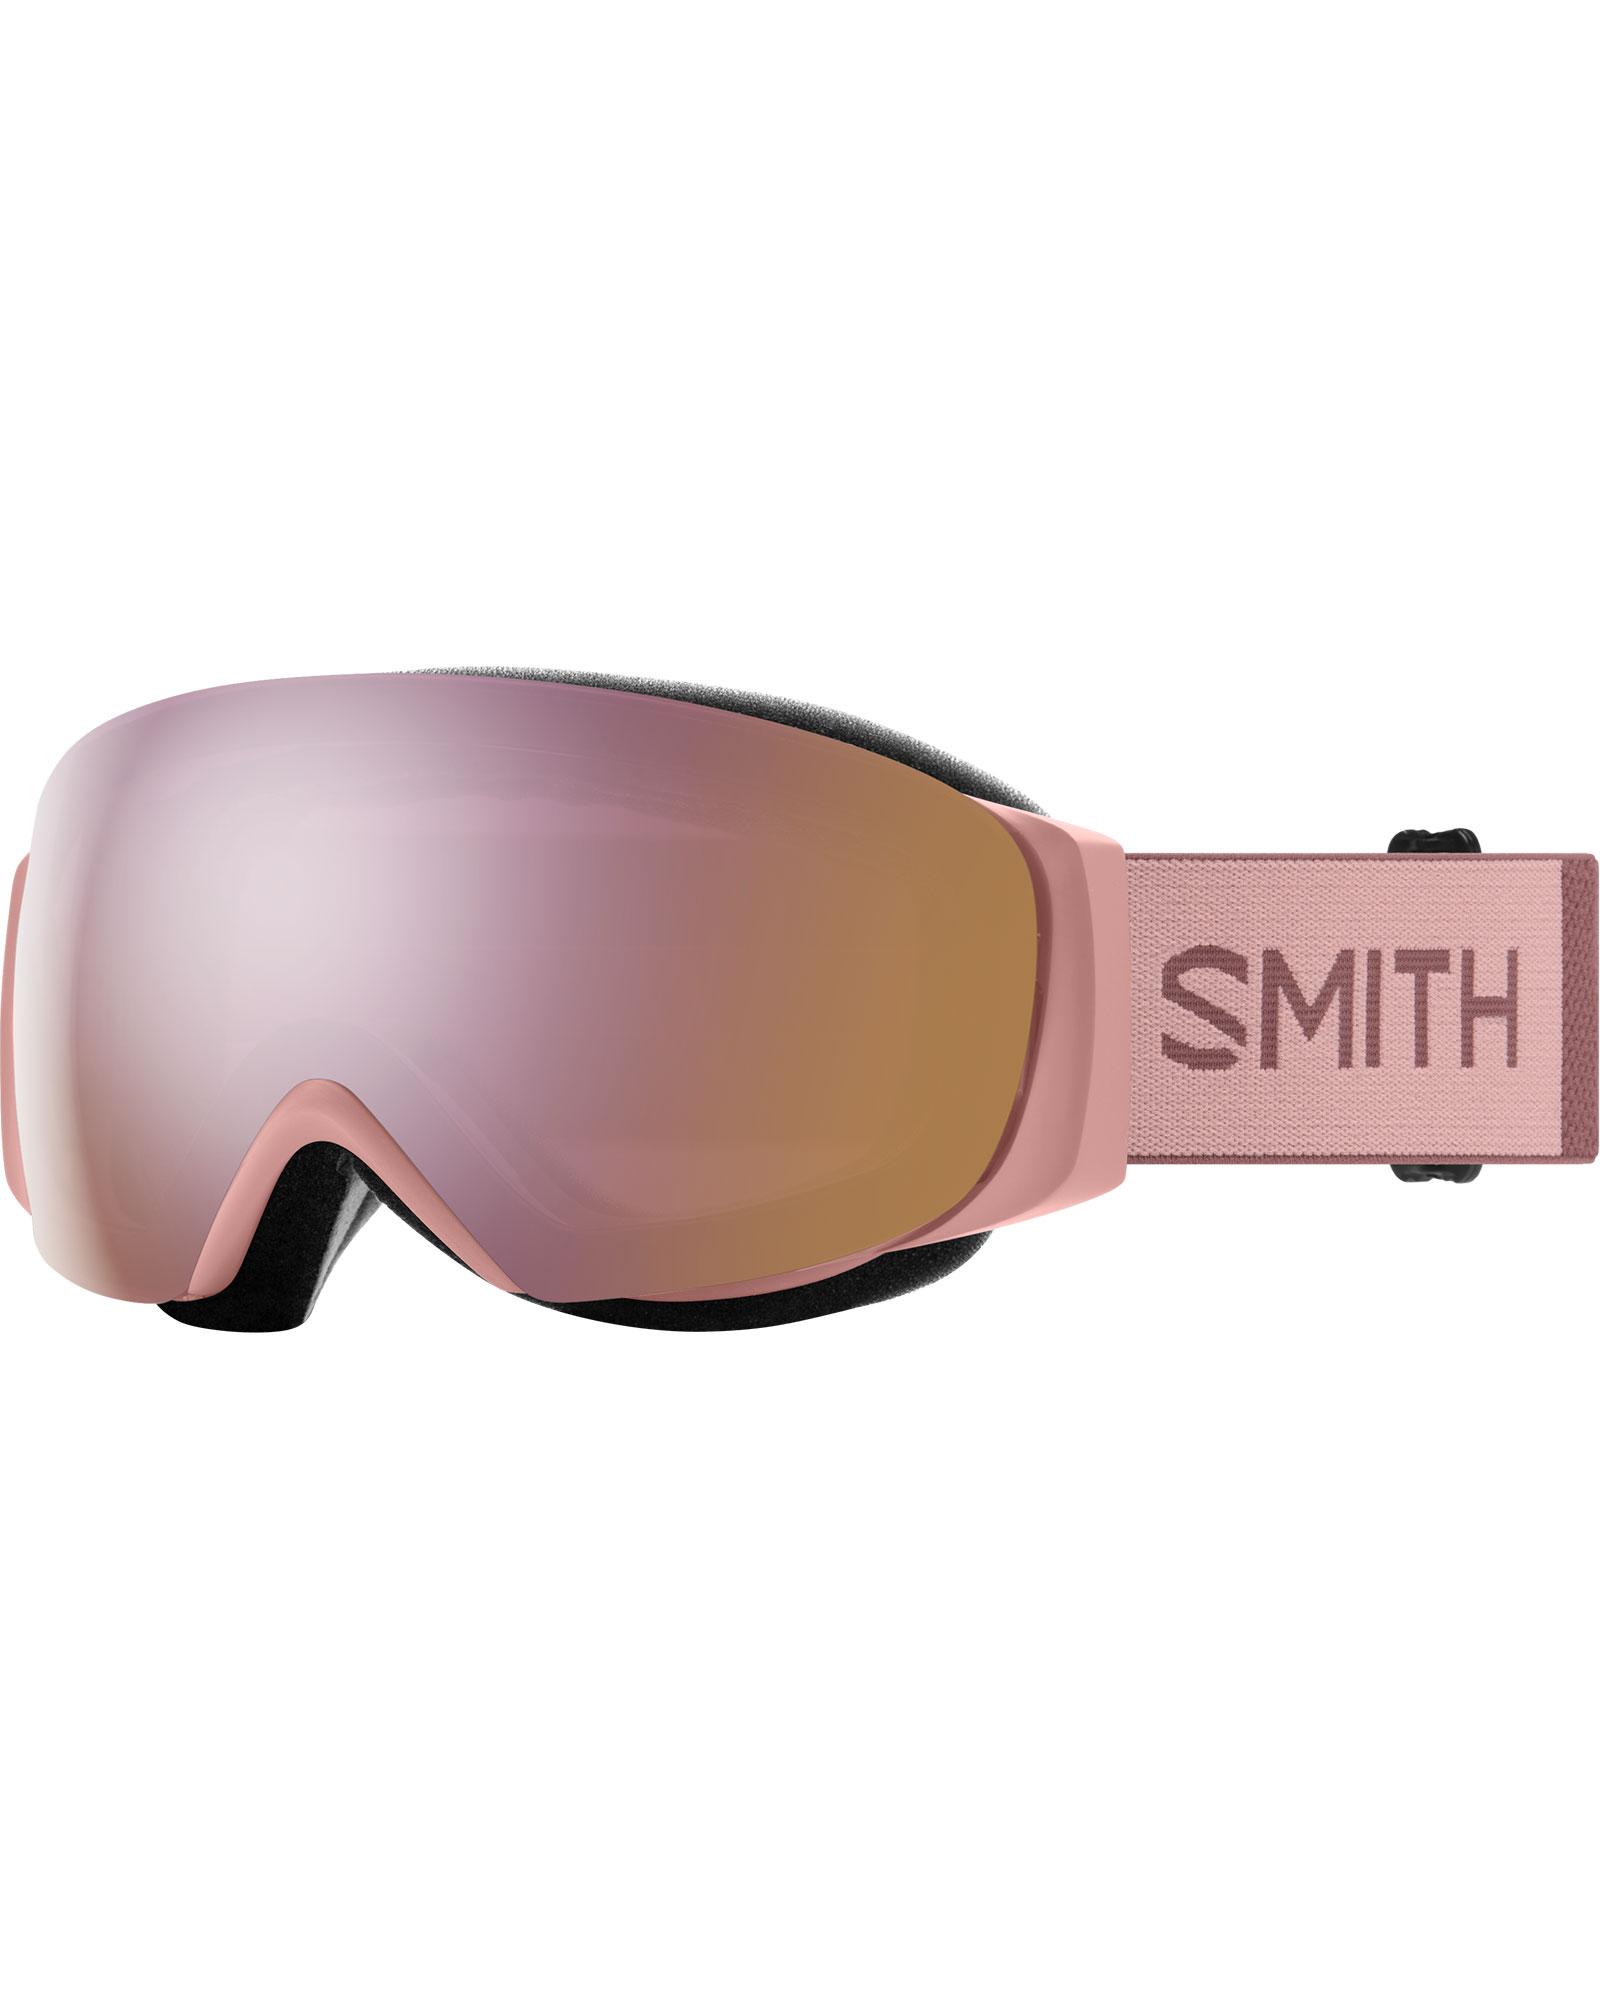 Smith Women's I/O MAG S Rock Salt/Tannin / ChromaPop Everyday Rose Gold Mirror + ChromaPop Storm Rose Flash Goggles 2020 / 2021 0